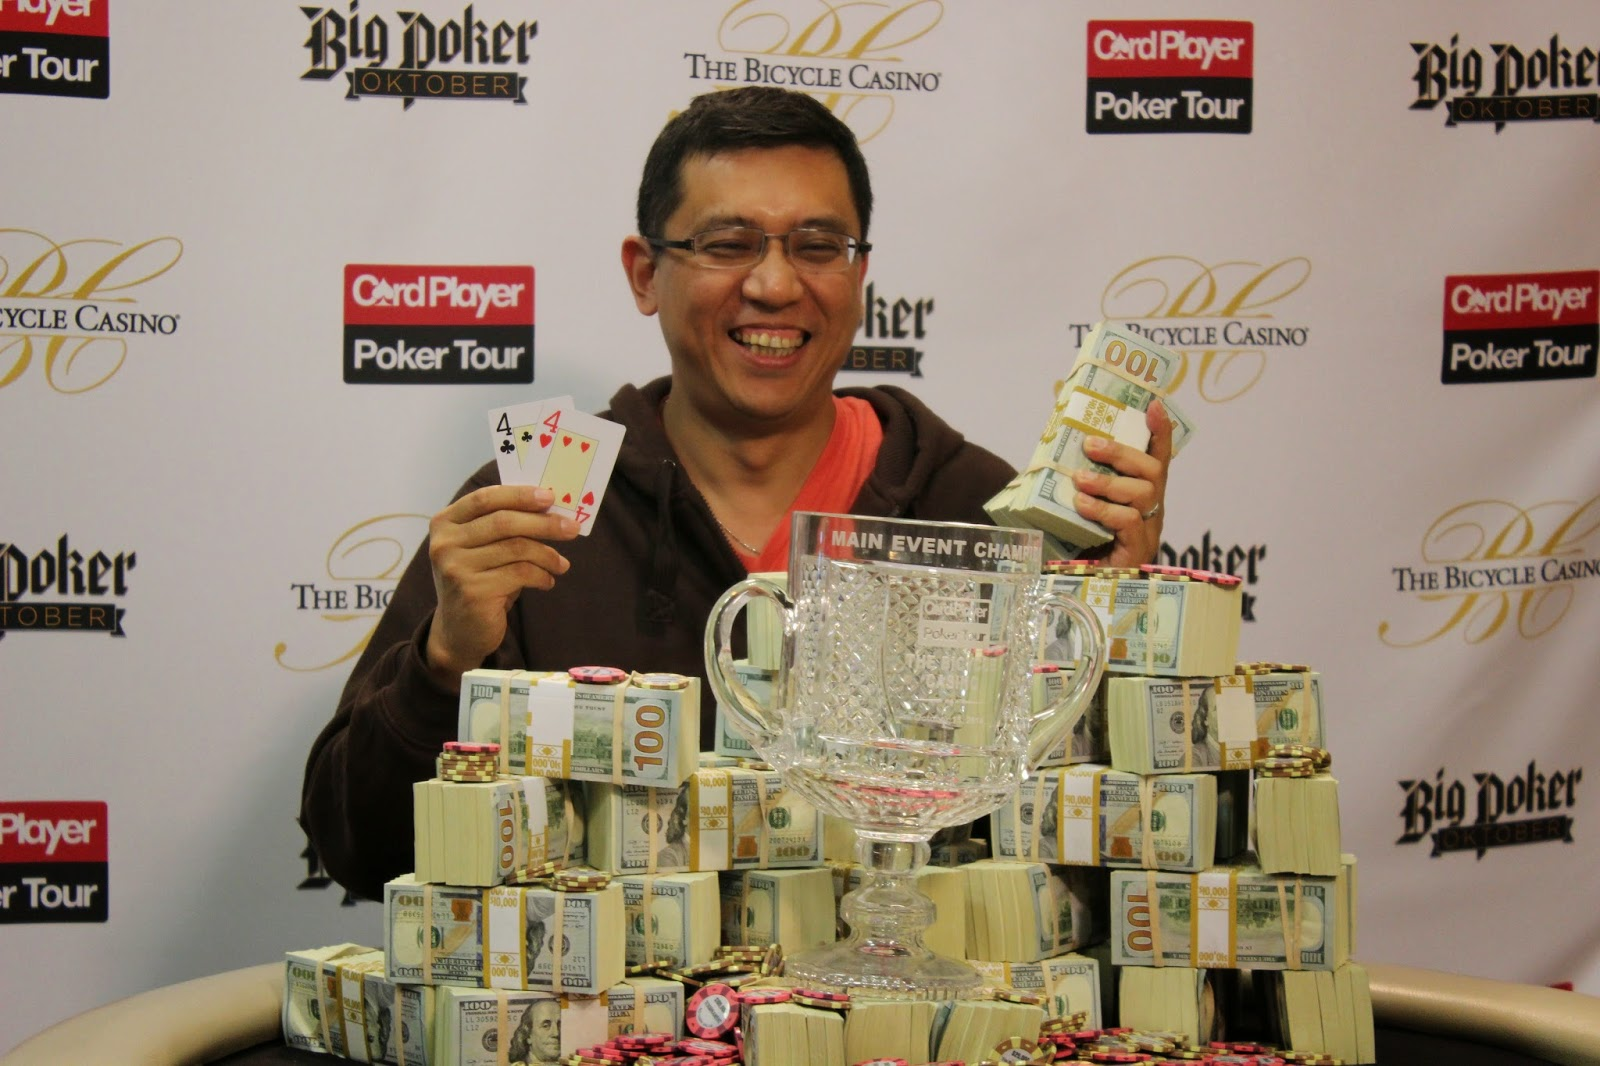 Poker ladbrokes casinoguide proposed casino